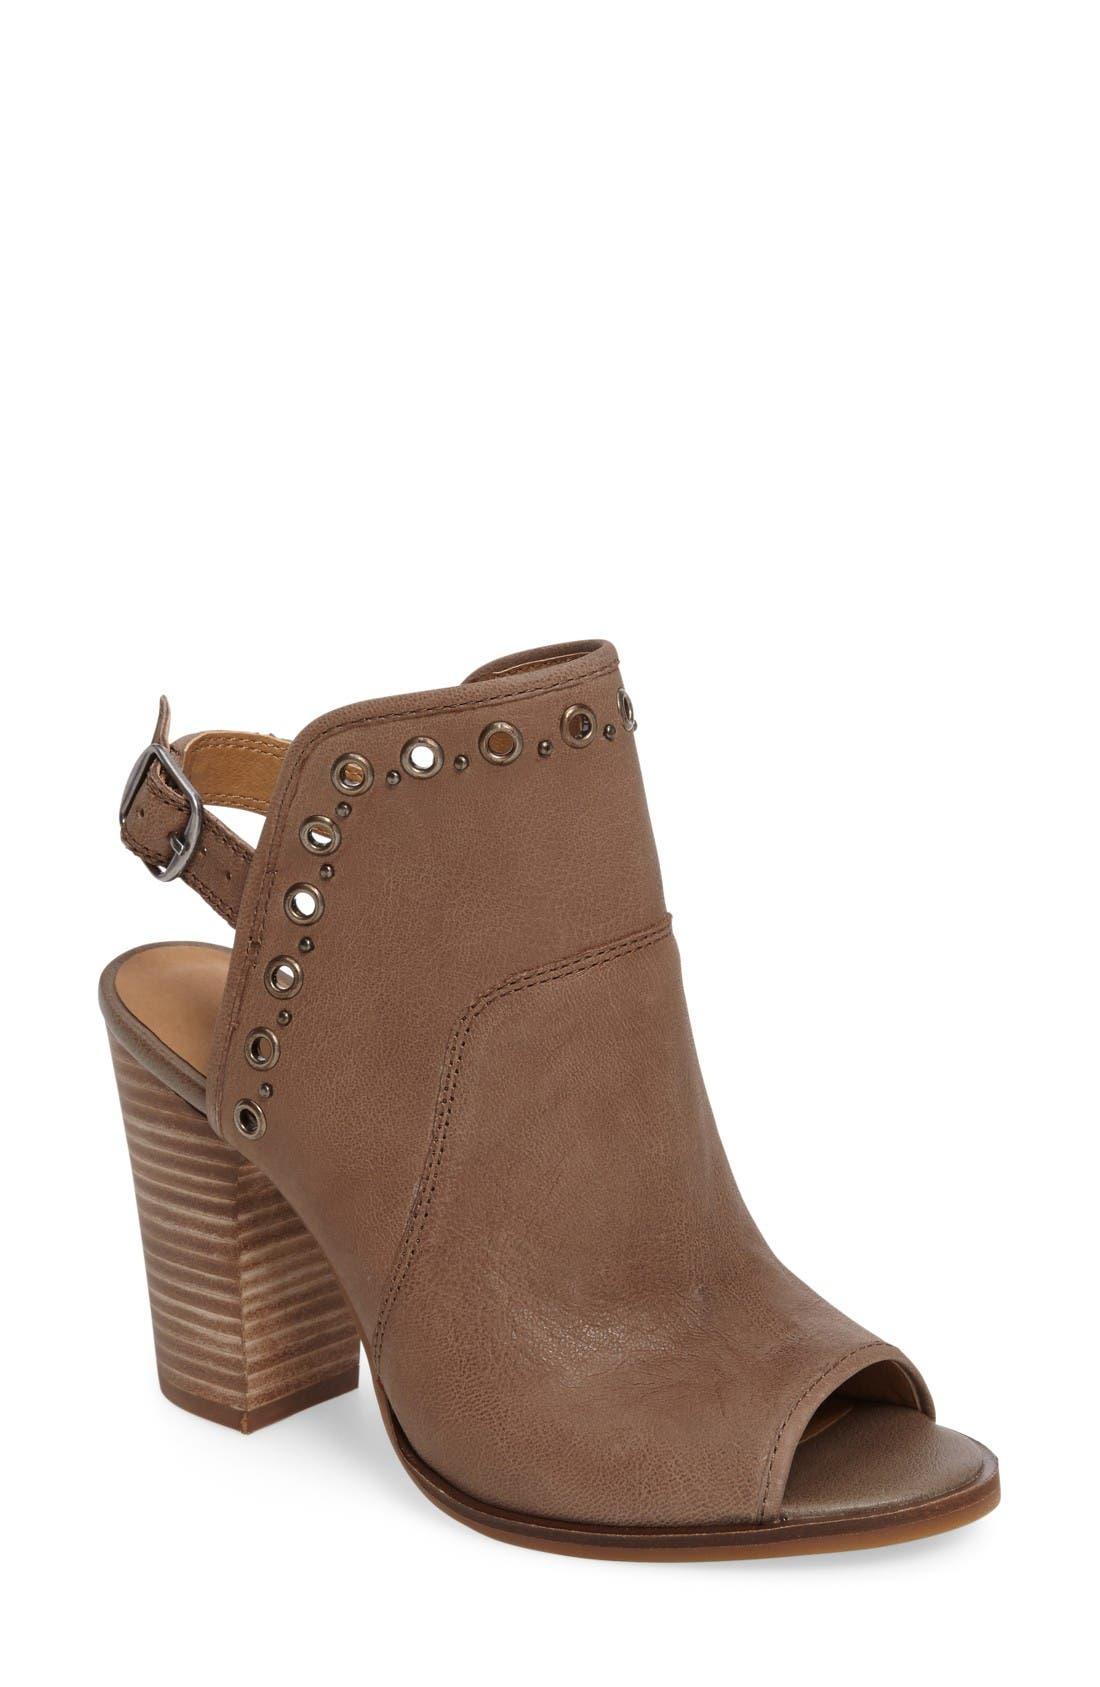 Alternate Image 1 Selected - Lucky Brand Lorillar Sandal (Women)